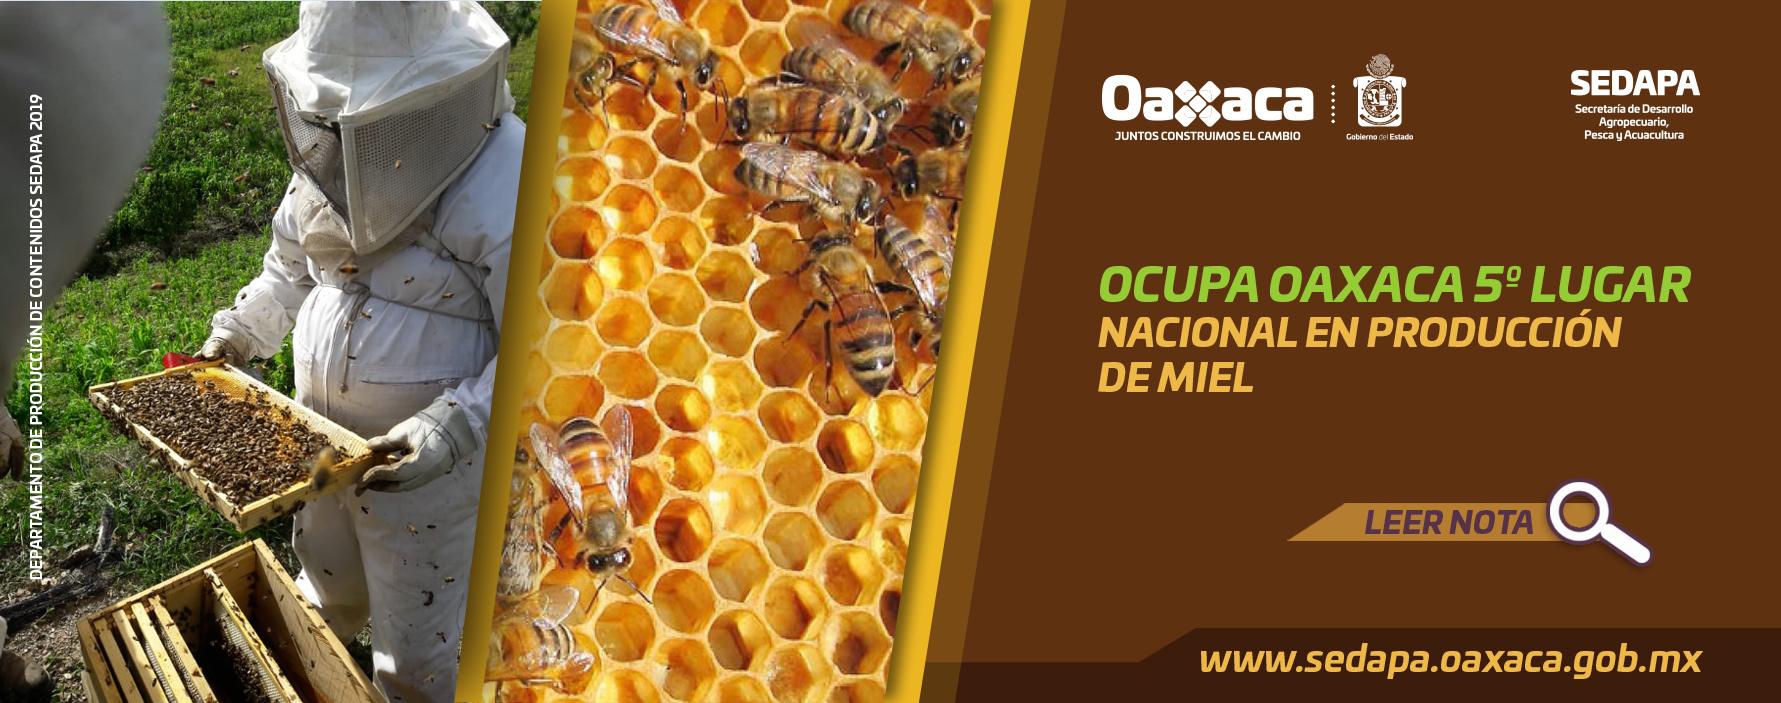 Oaxaca 5º Lugar a Nivel Nacional en Producción de Miel.